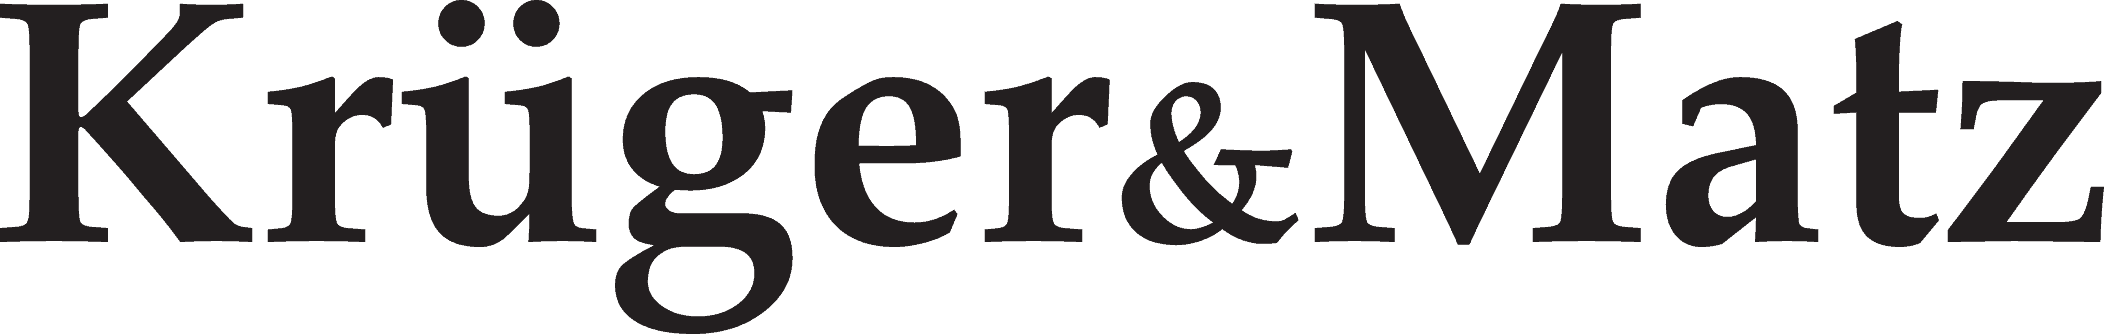 KM_logo_black